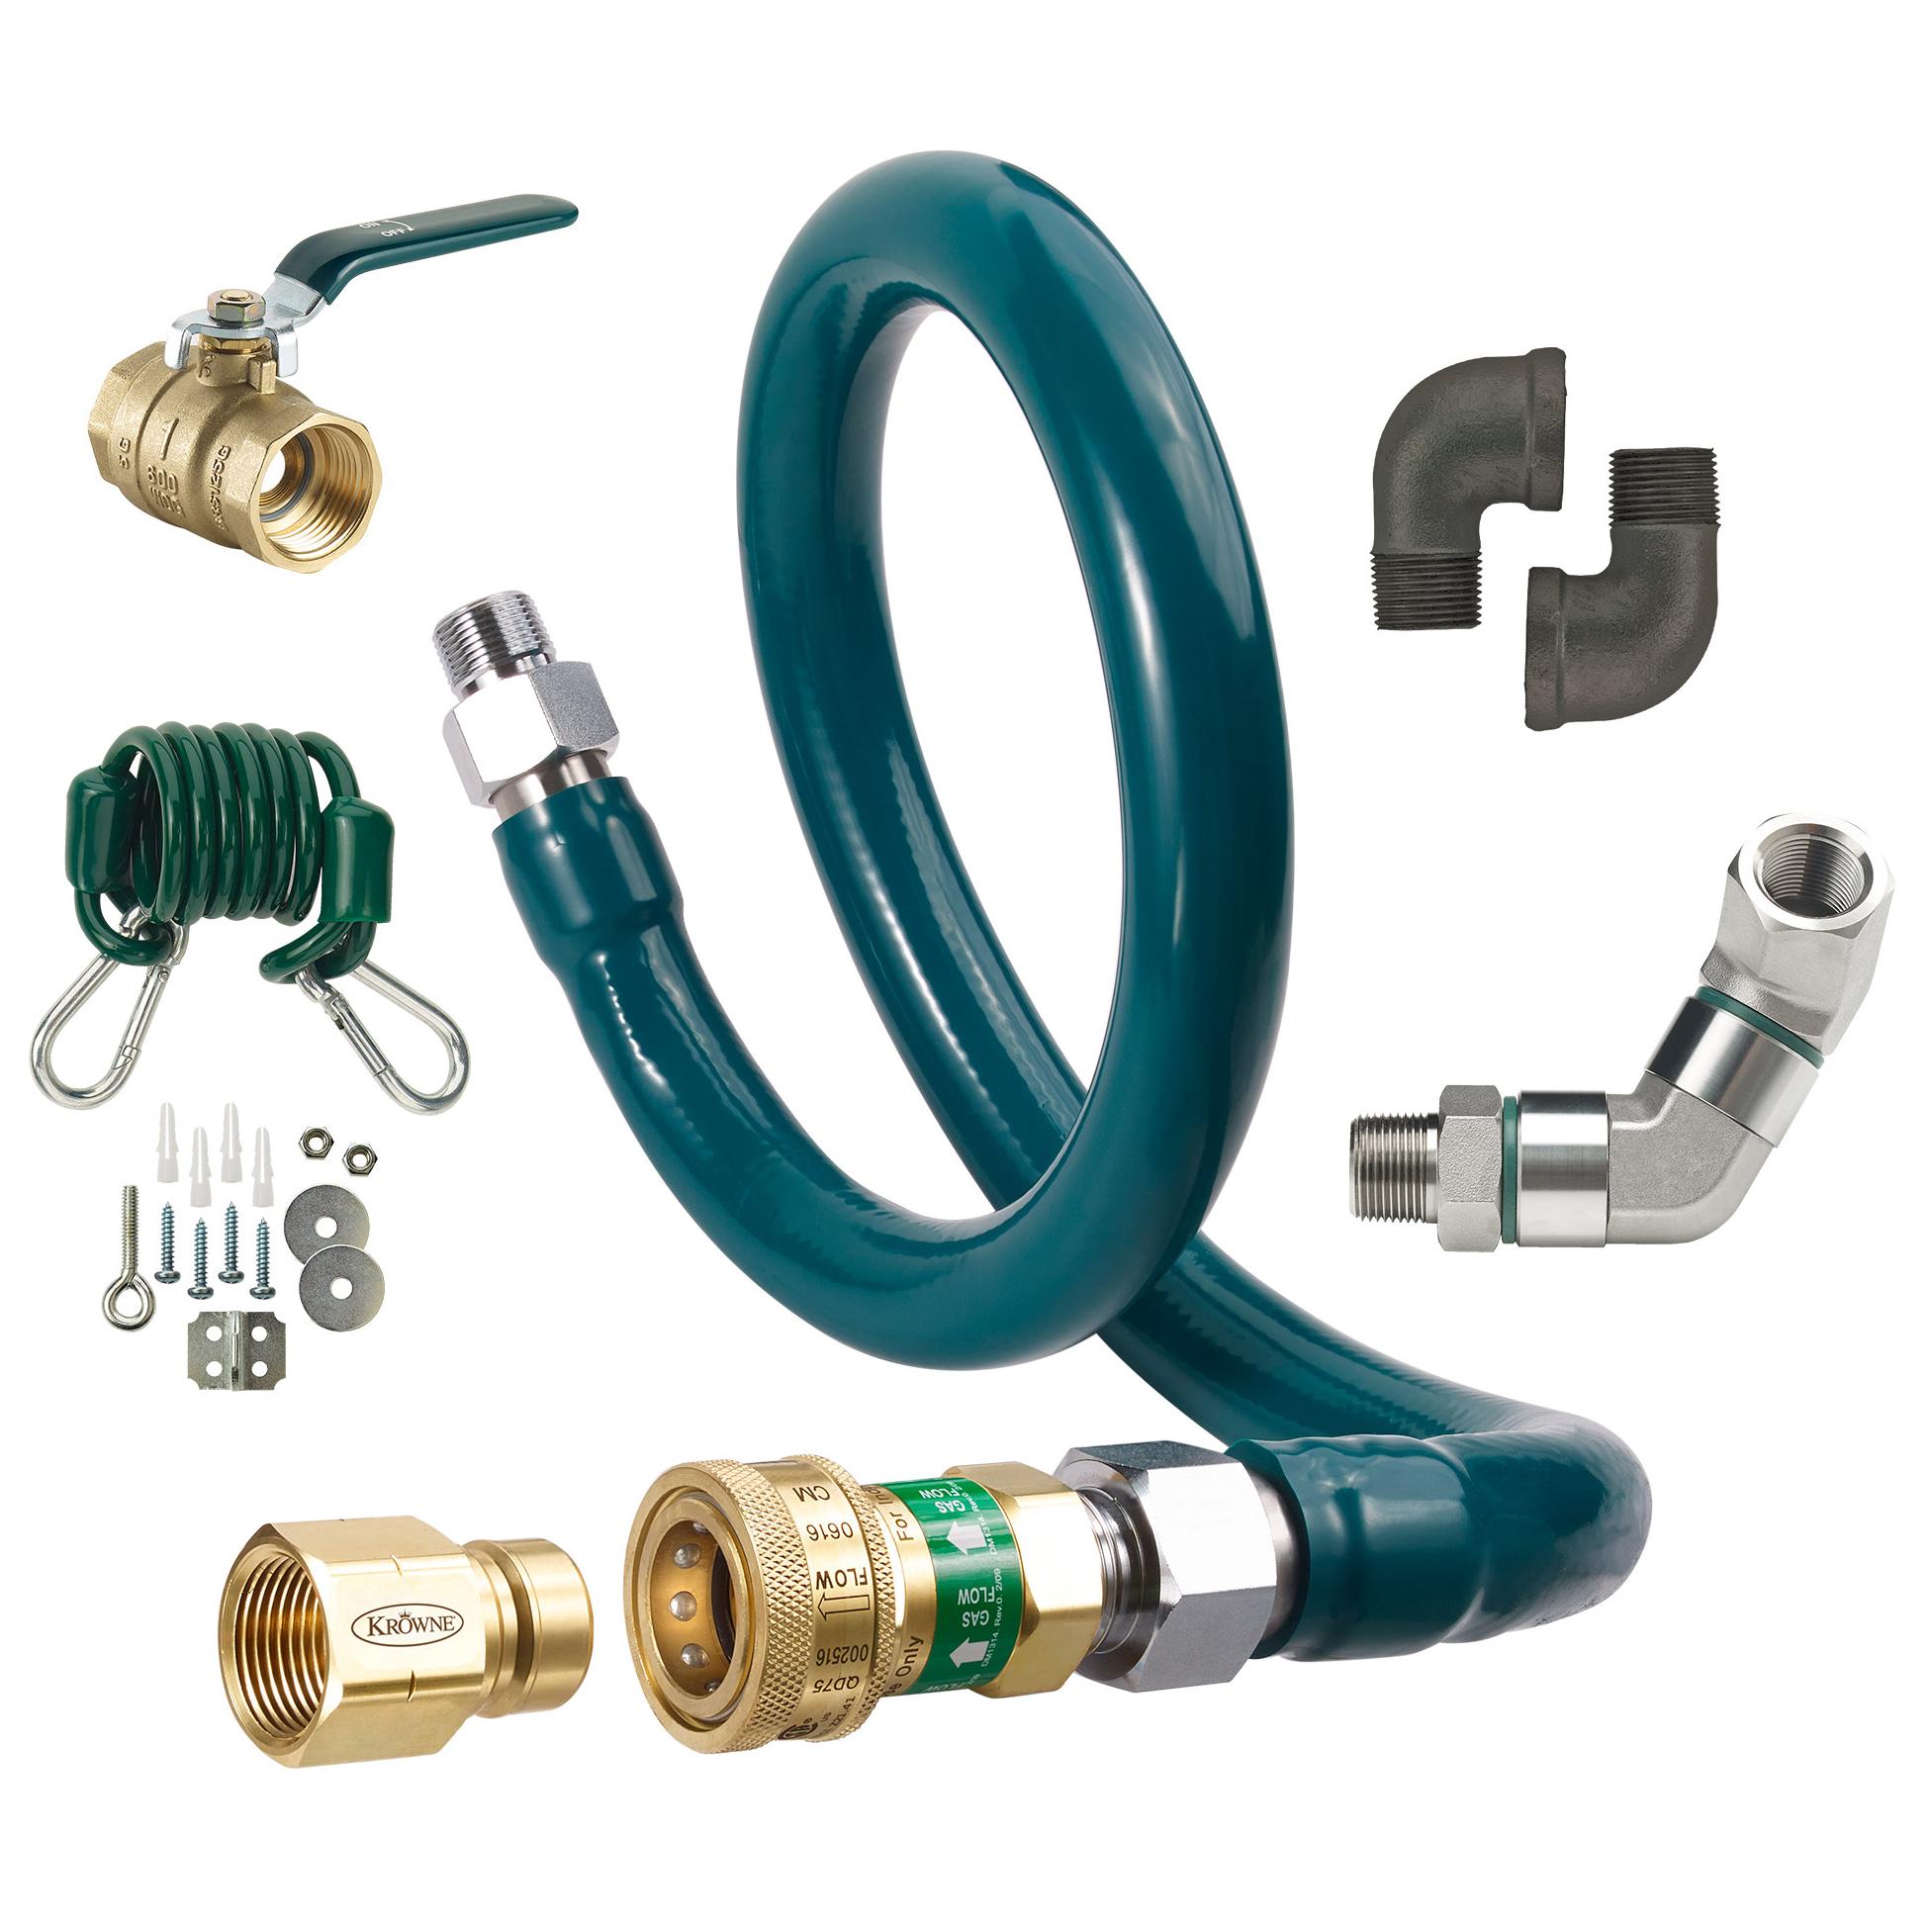 Krowne Metal M5024K9 gas connector hose kit